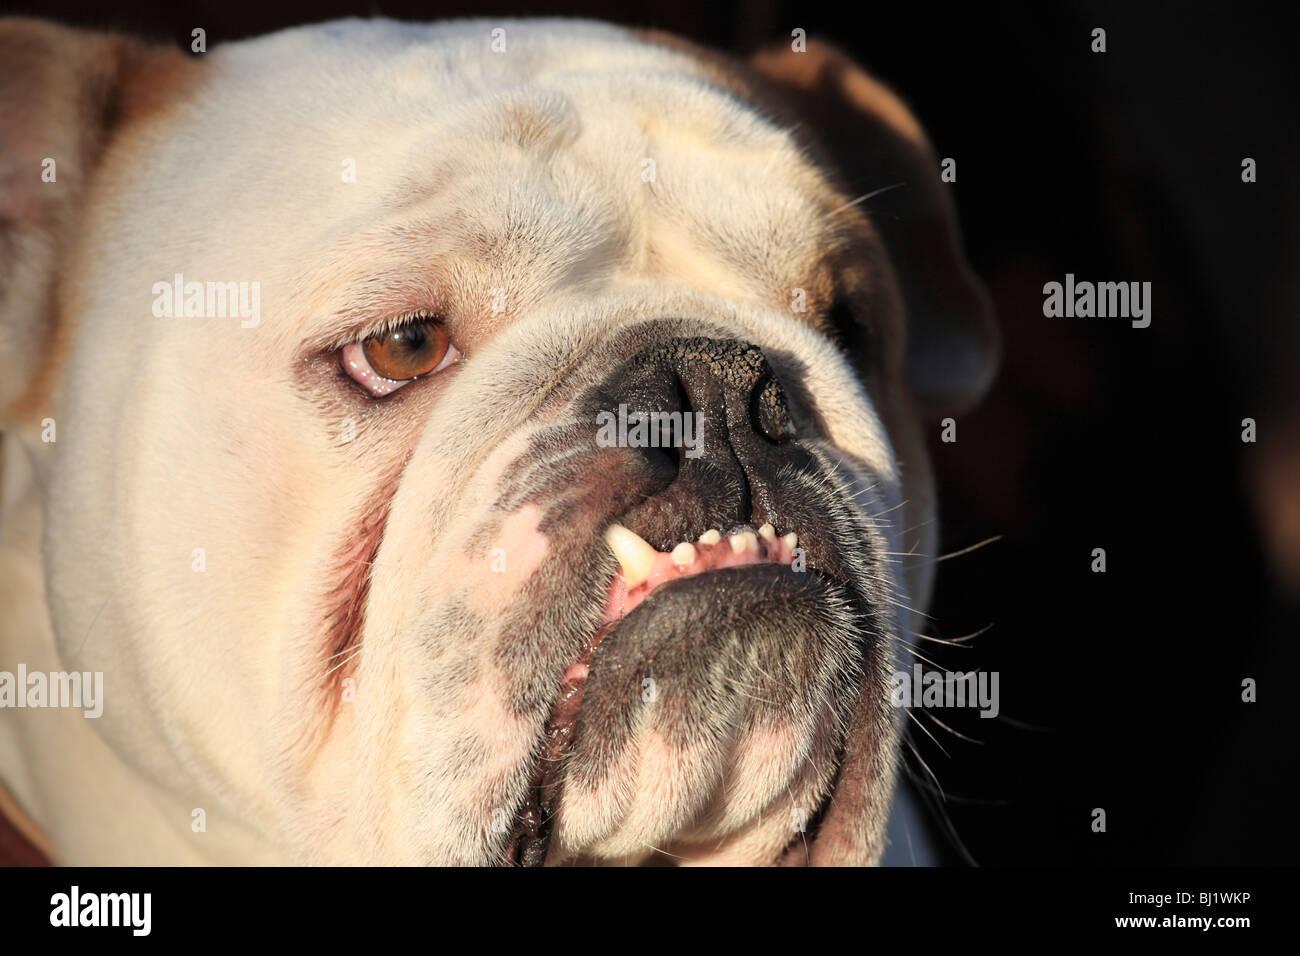 Bulldog portrait - Stock Image